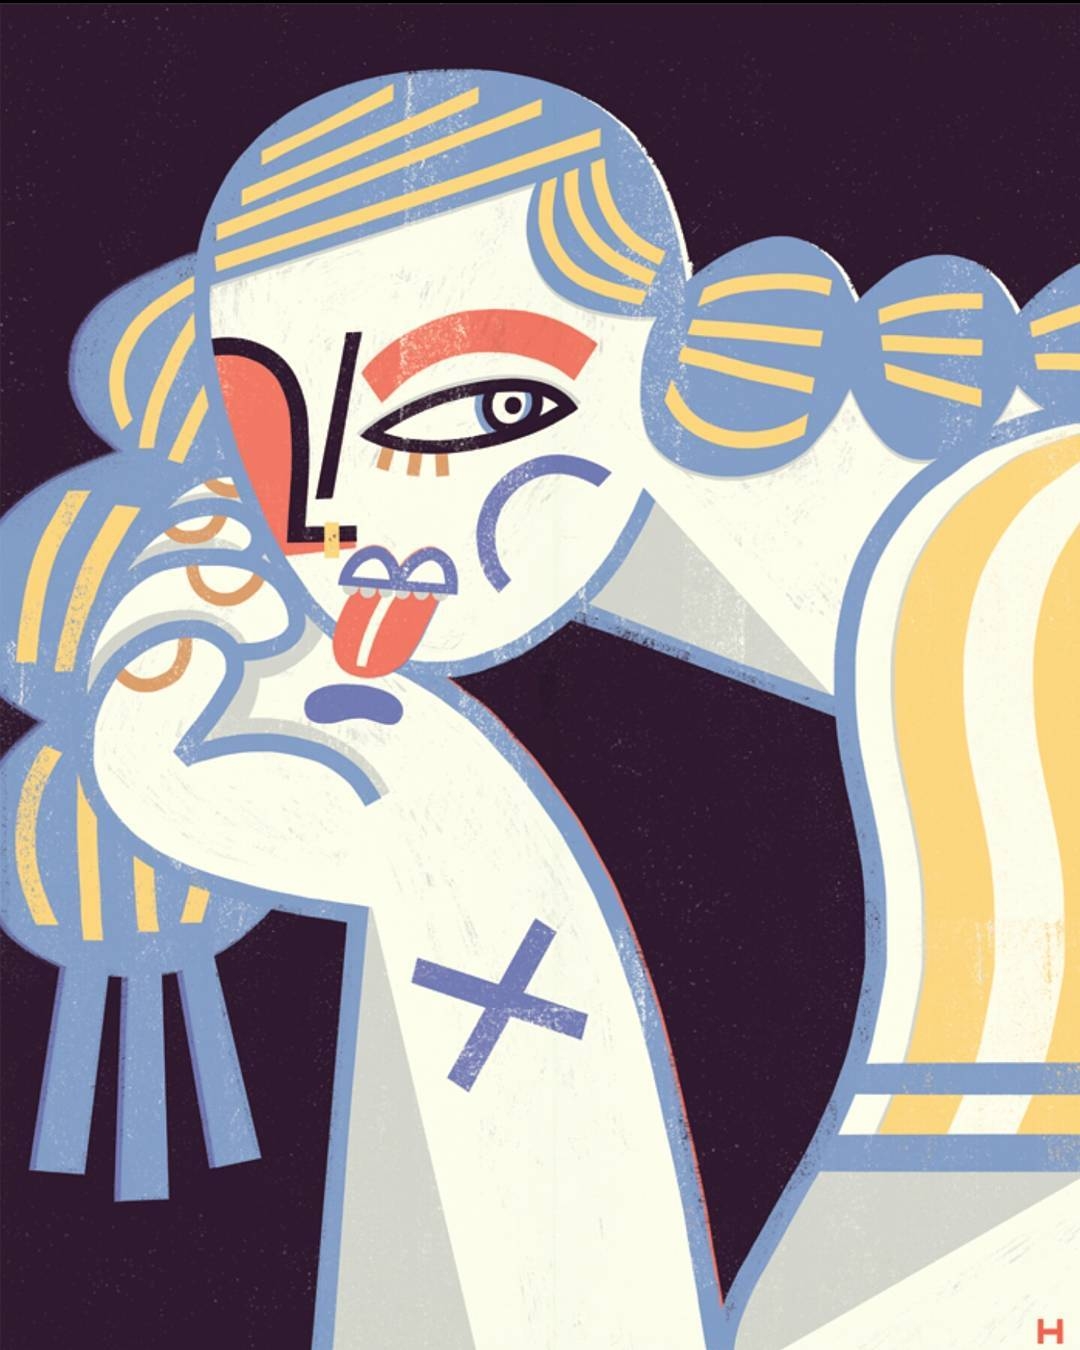 Gosia Herba抽象风格插画设计